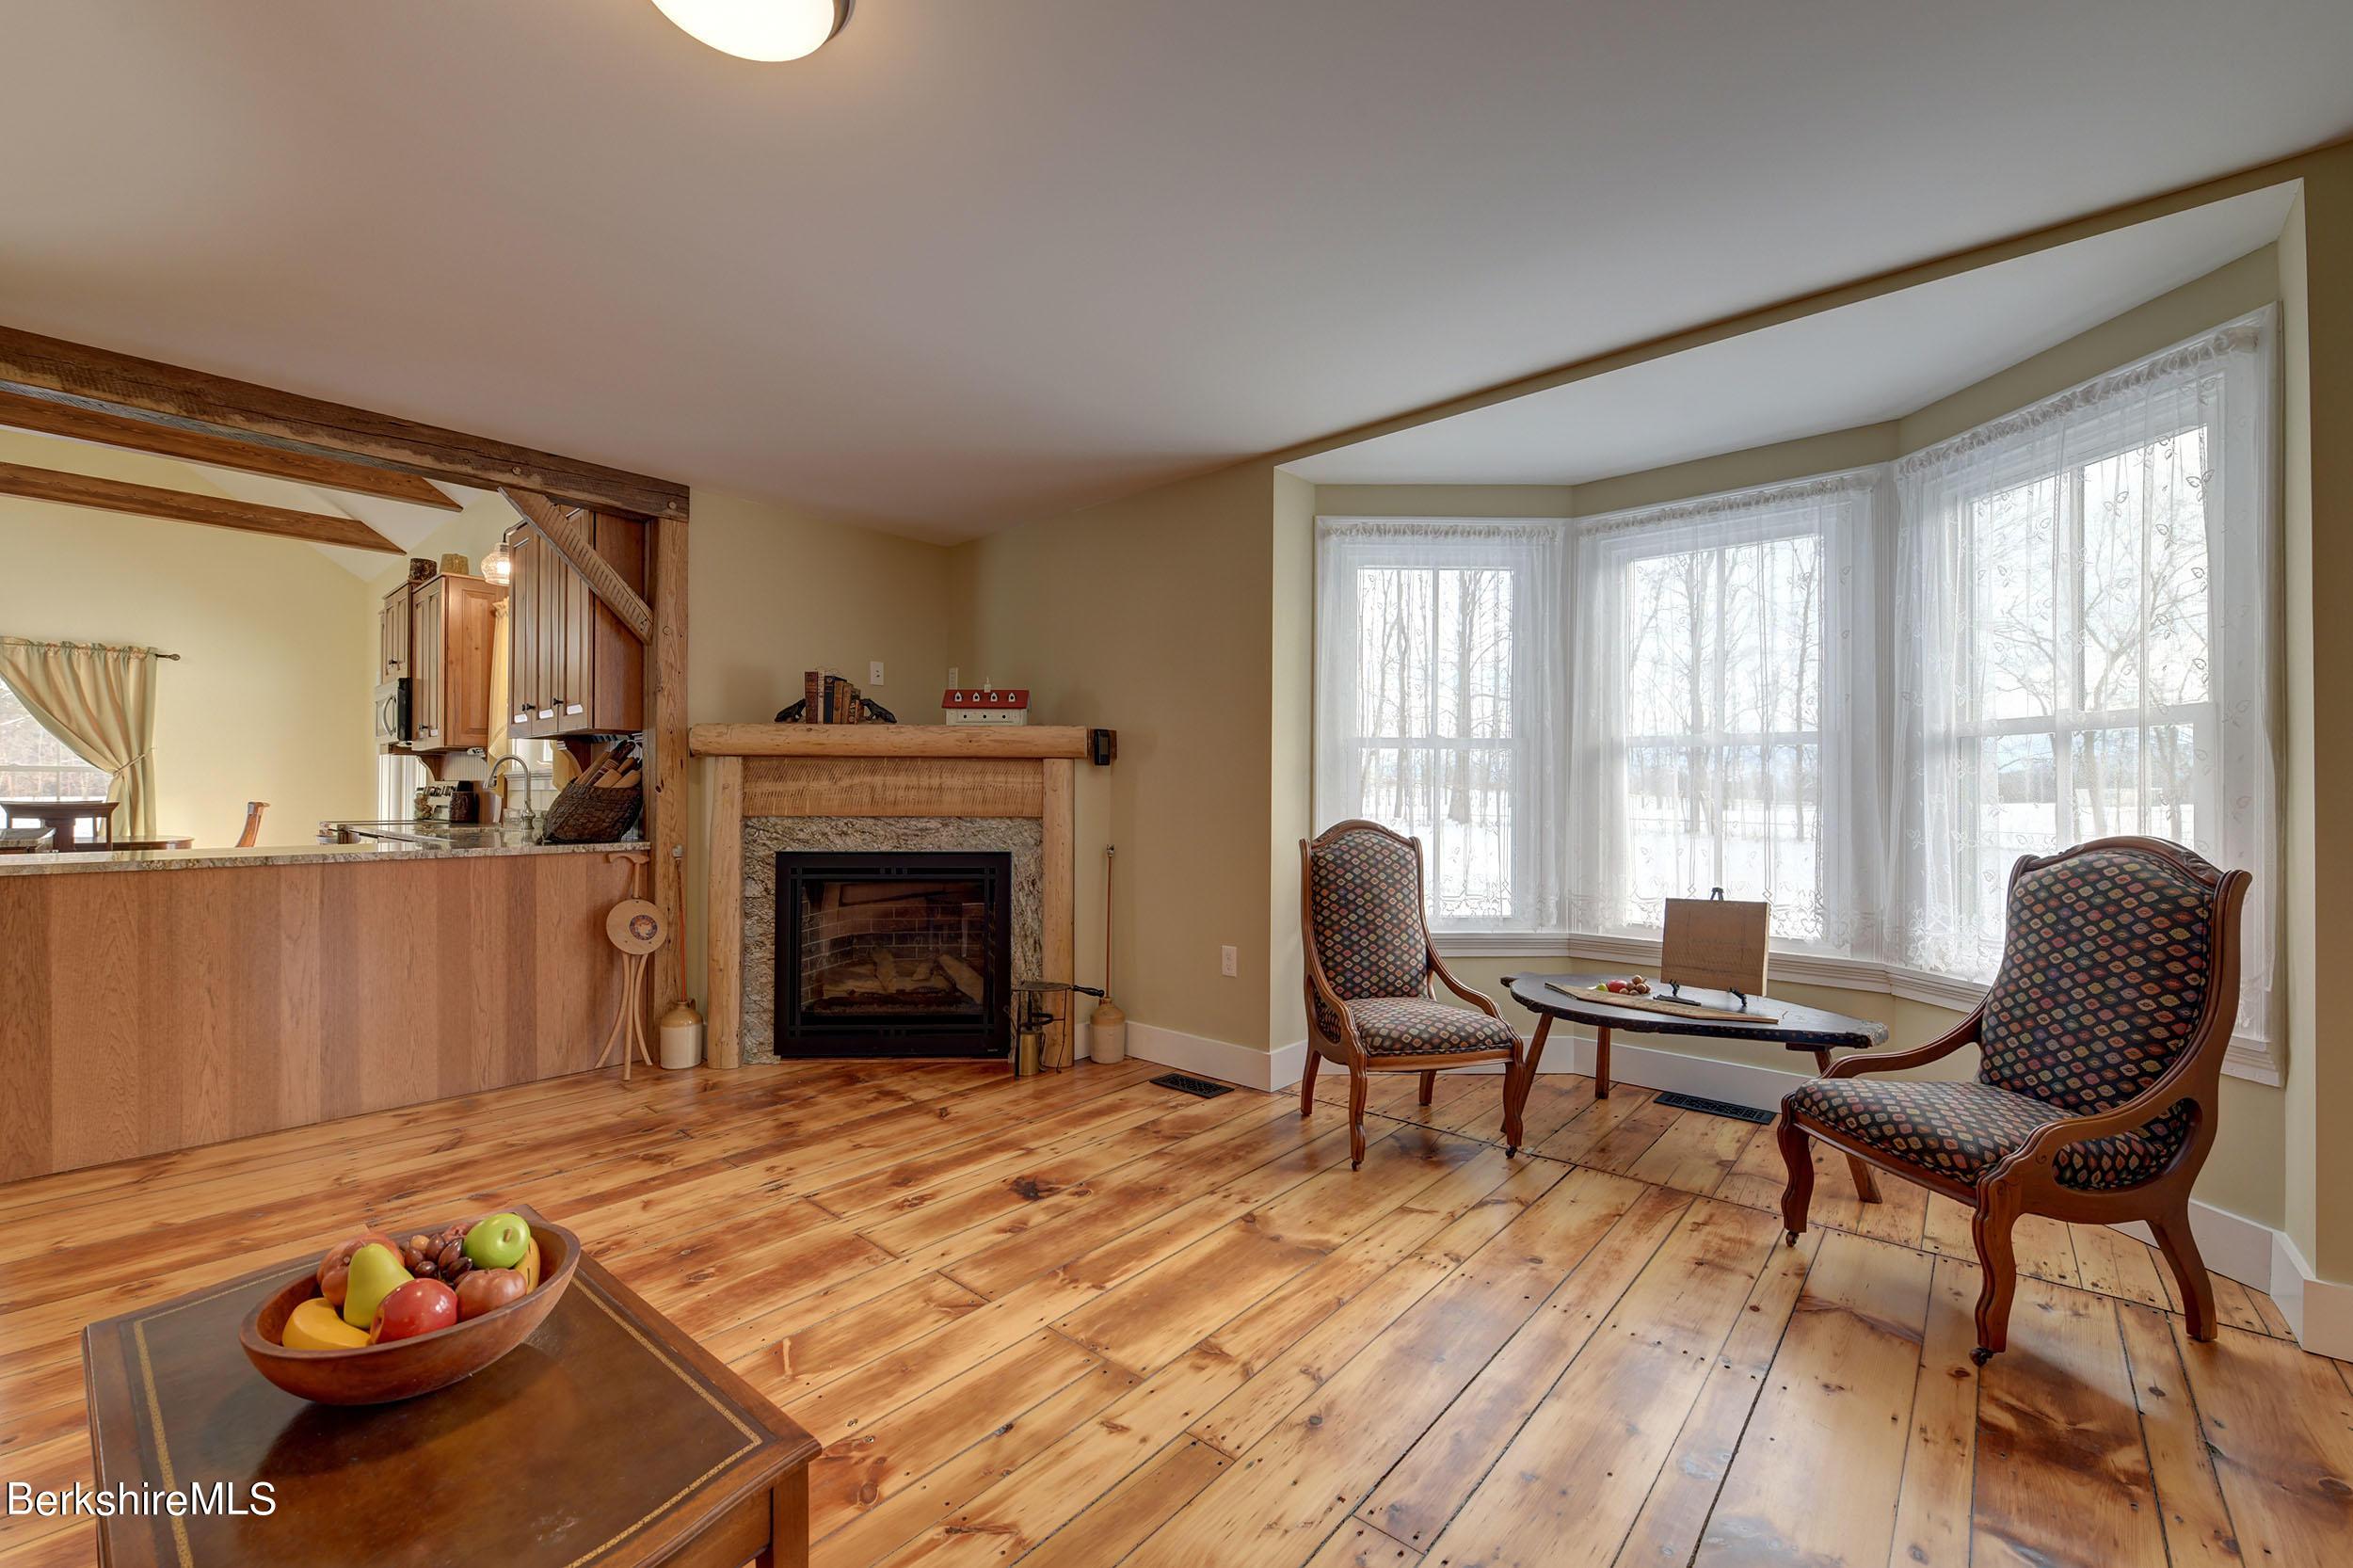 169 Ashley Falls, Sheffield, Massachusetts 01257, 3 Bedrooms Bedrooms, 7 Rooms Rooms,2 BathroomsBathrooms,Residential,For Sale,Ashley Falls,233195